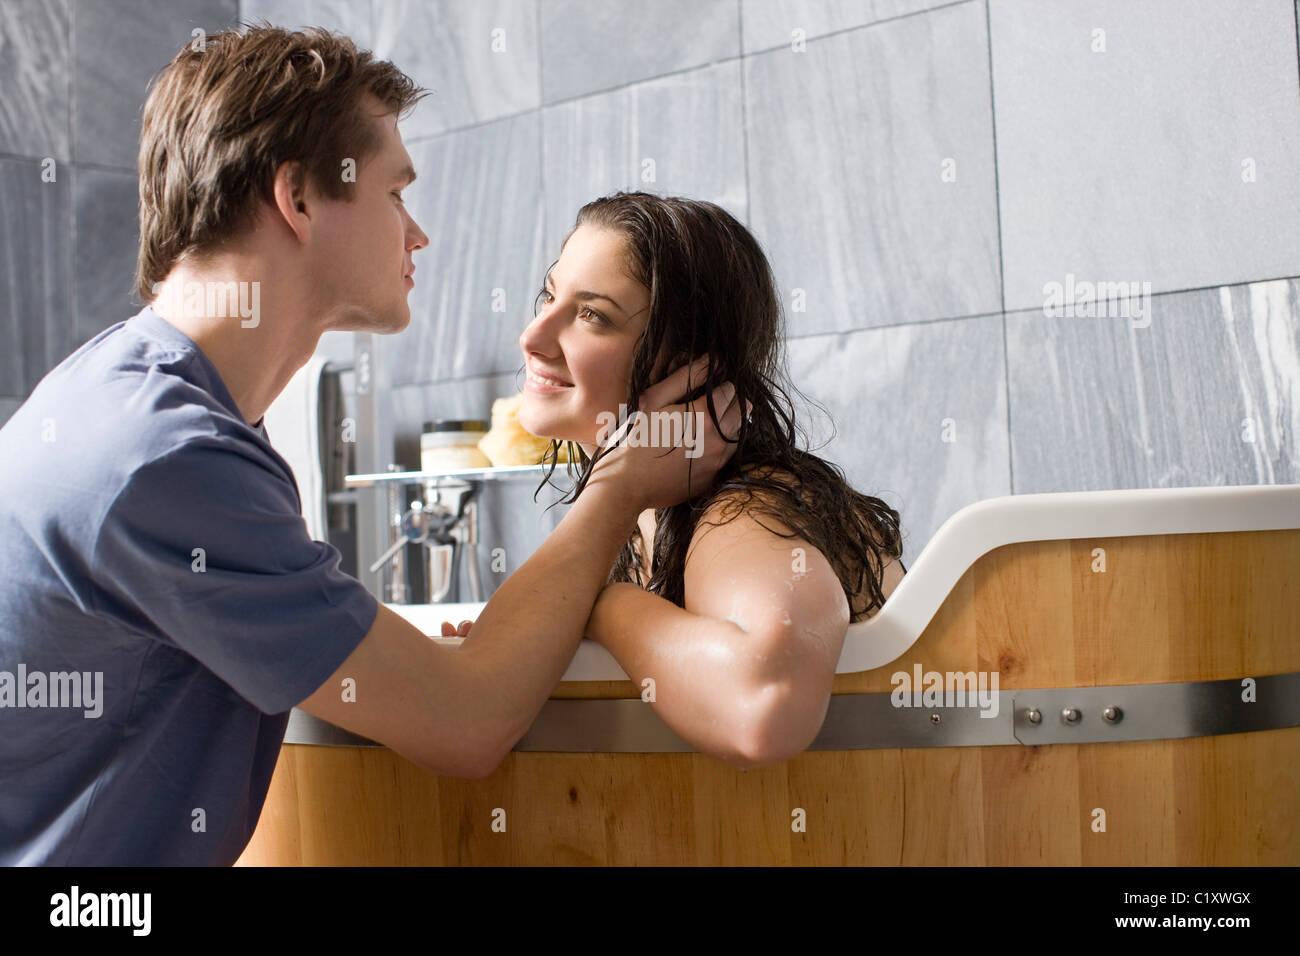 man kissing woman in bathroom